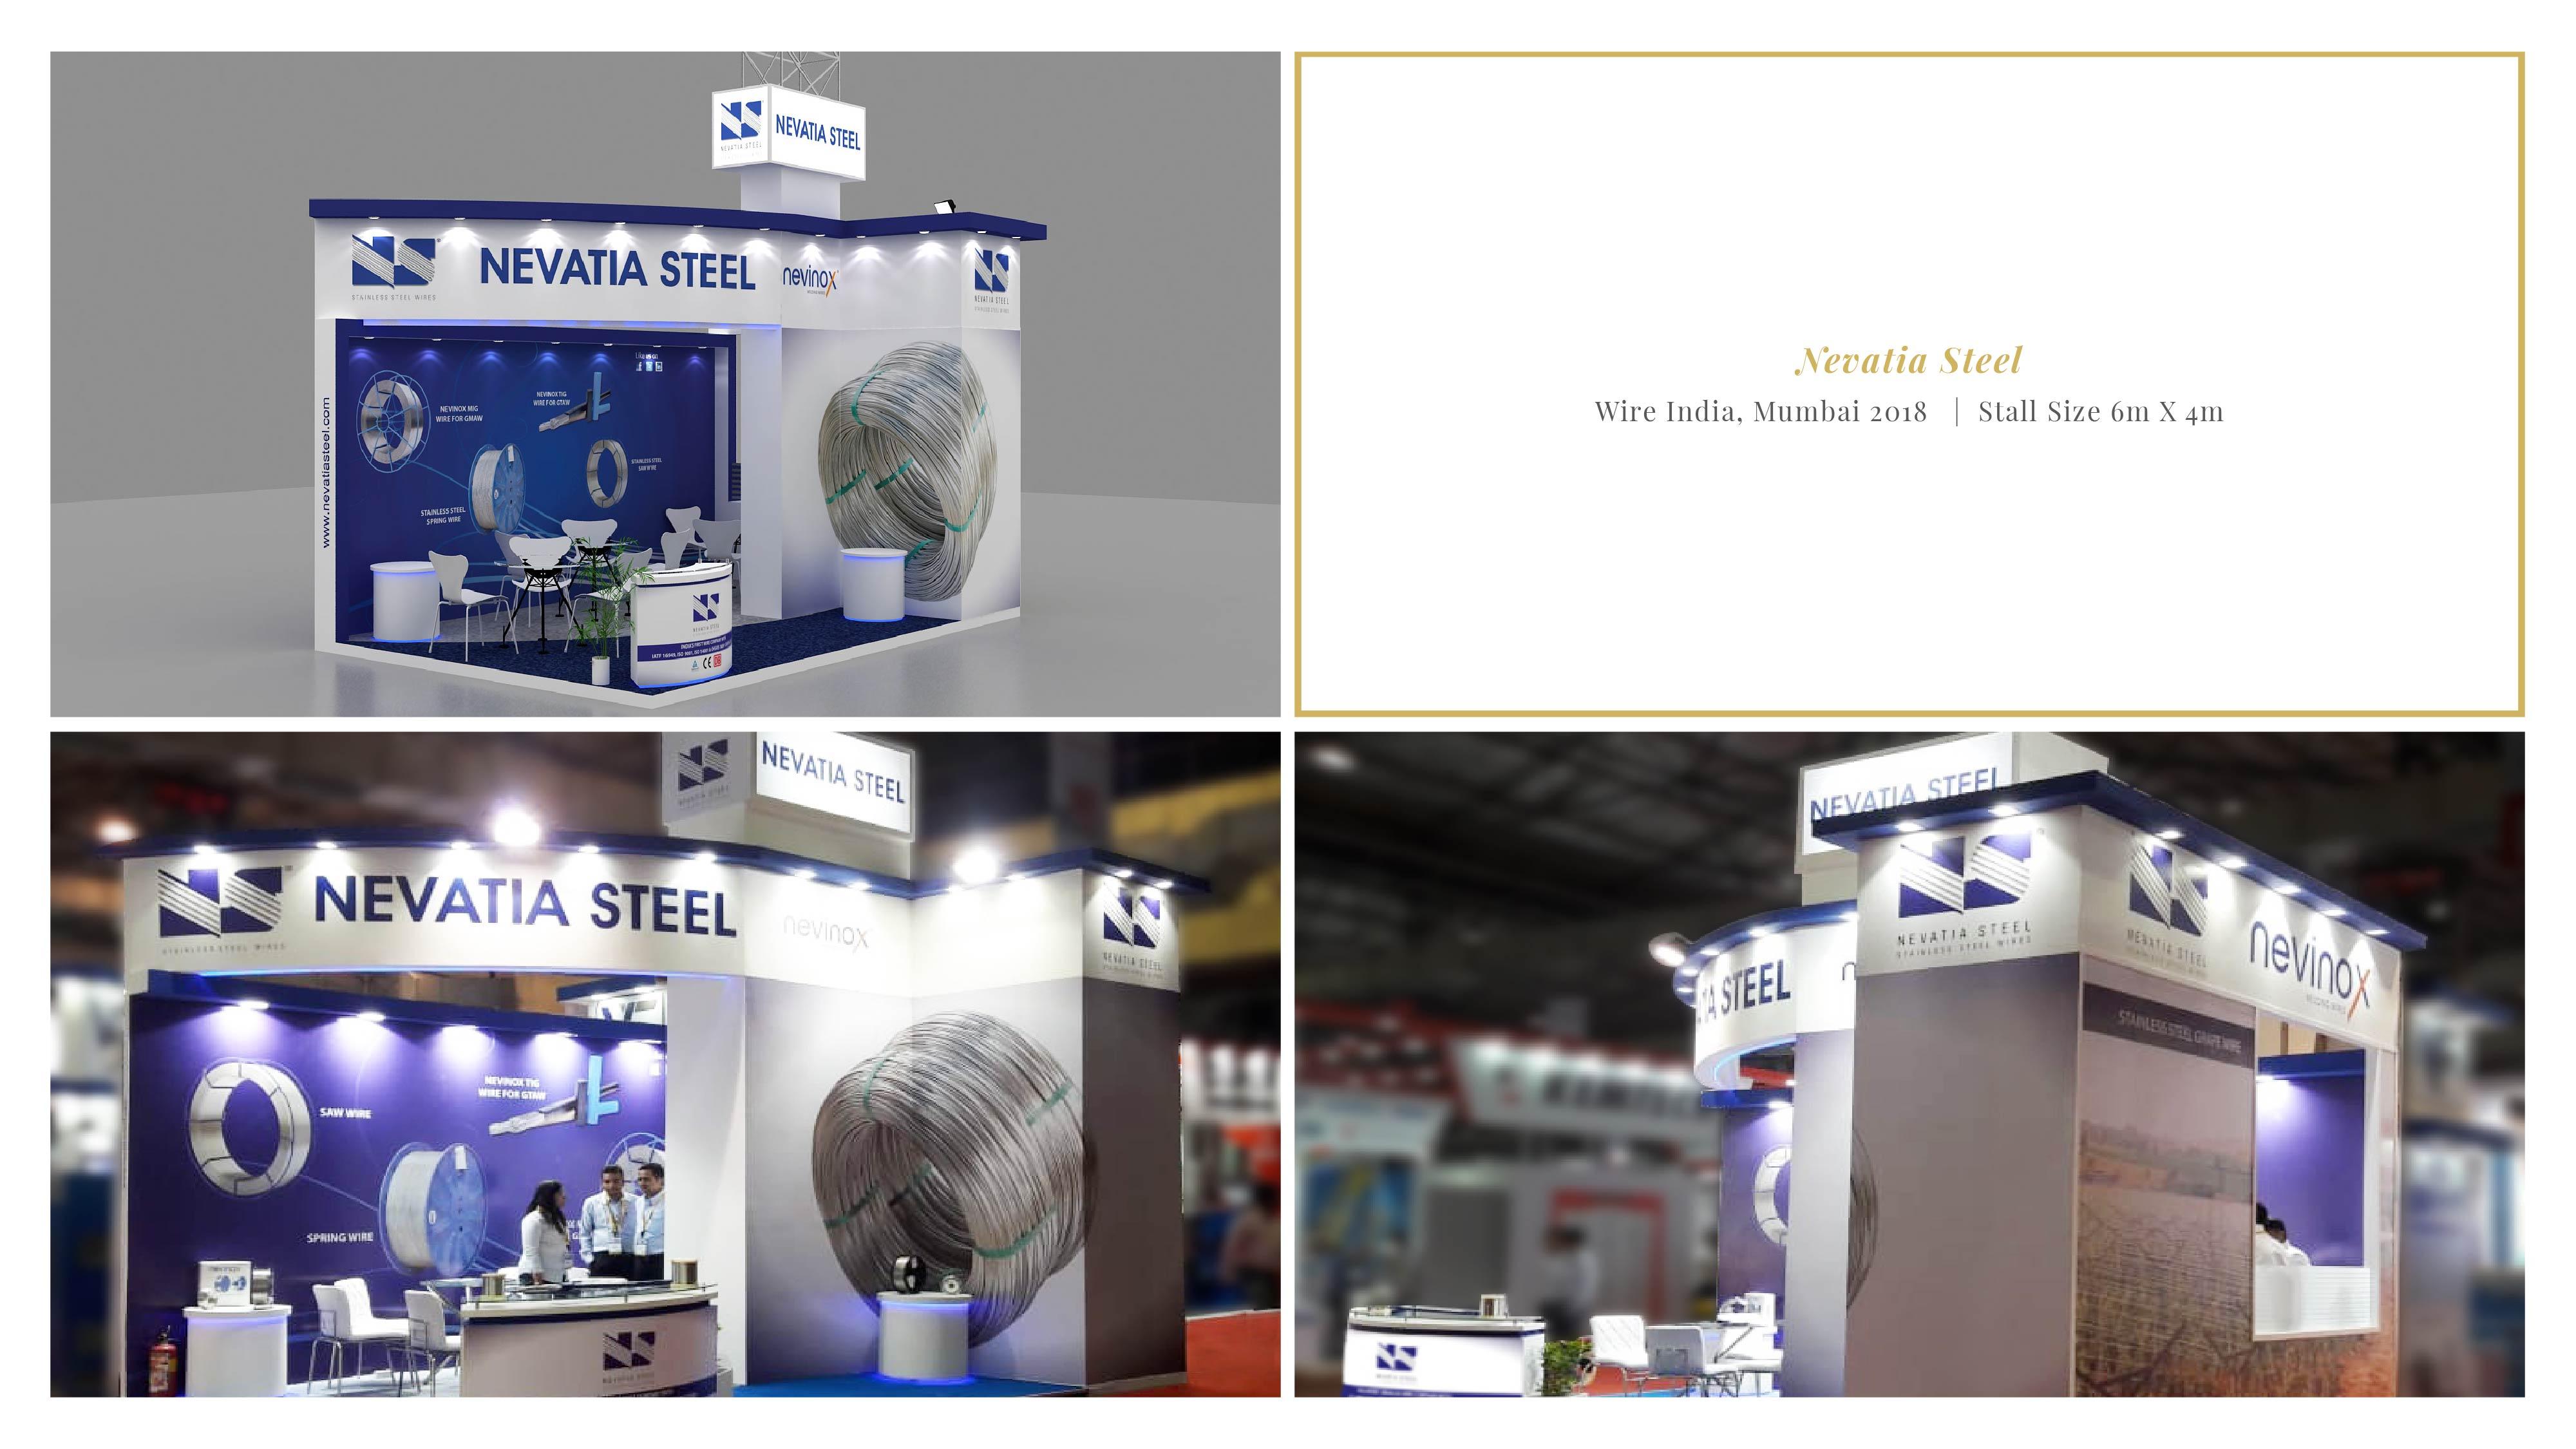 Nevatia Steel - Wire India 2018, Mumbai